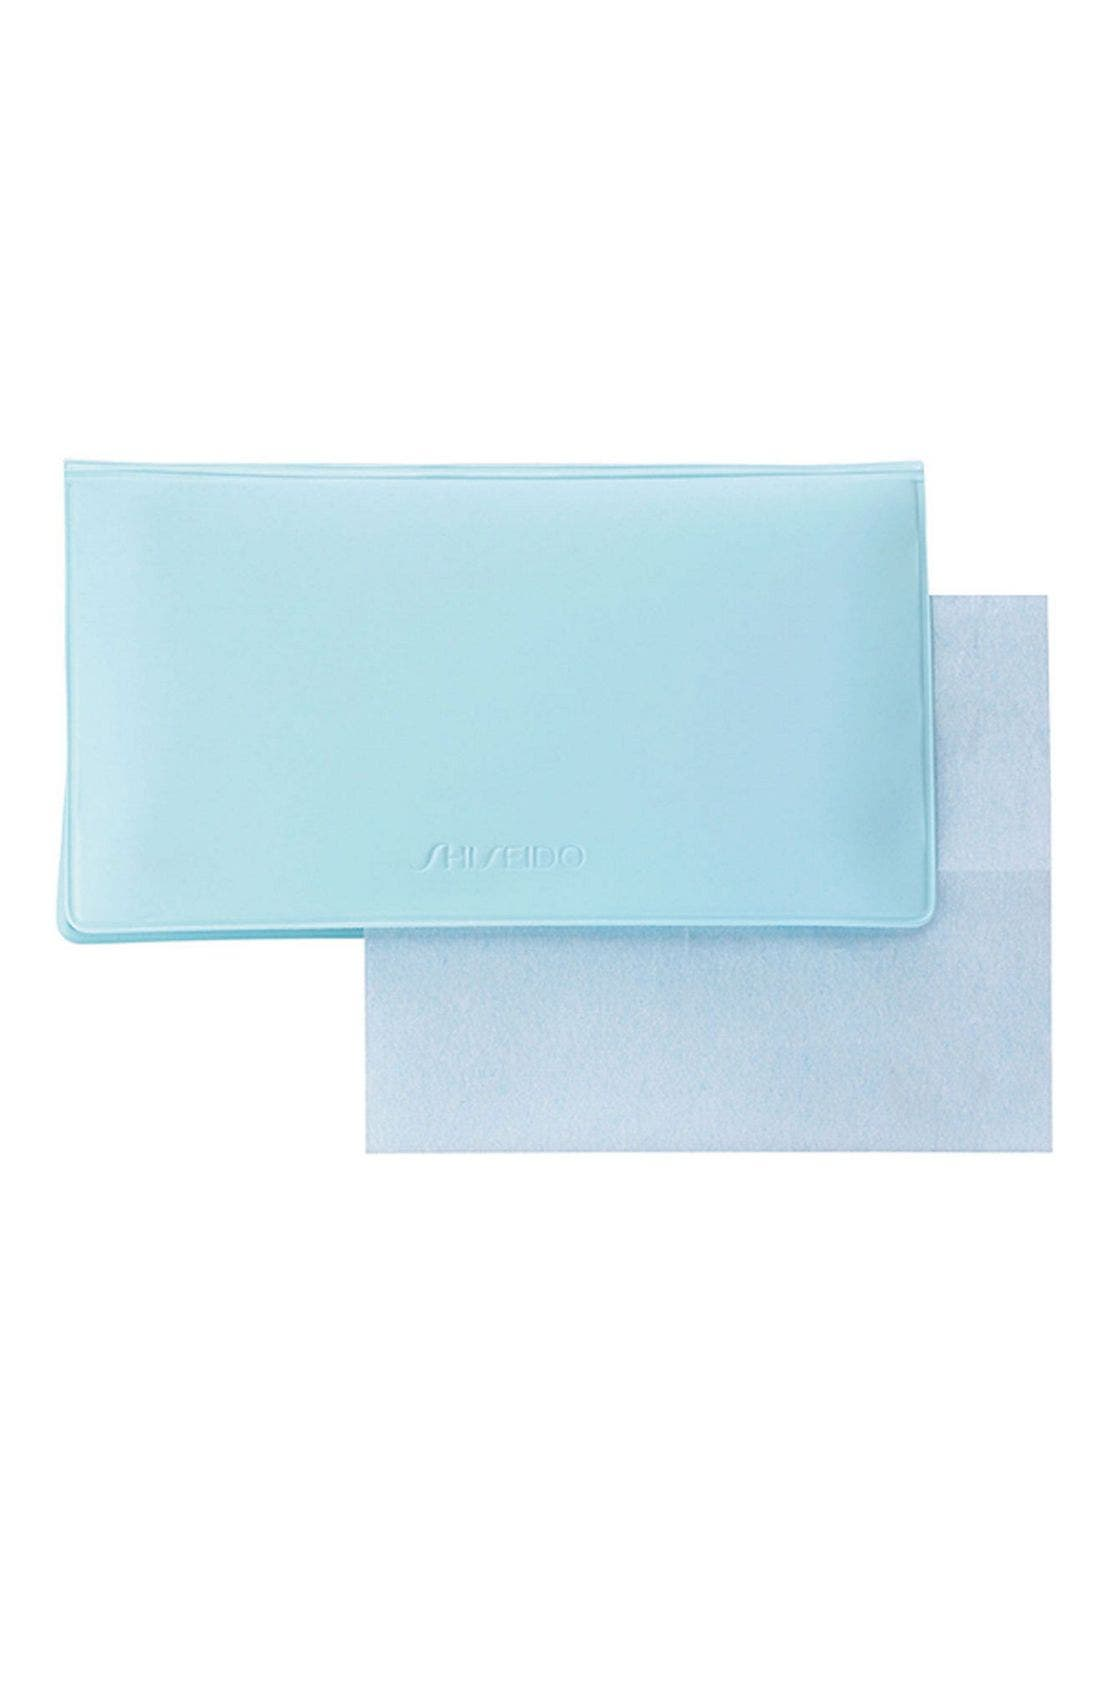 SHISEIDO 'Pureness' Oil-Control Blotting Paper, Main, color, 000